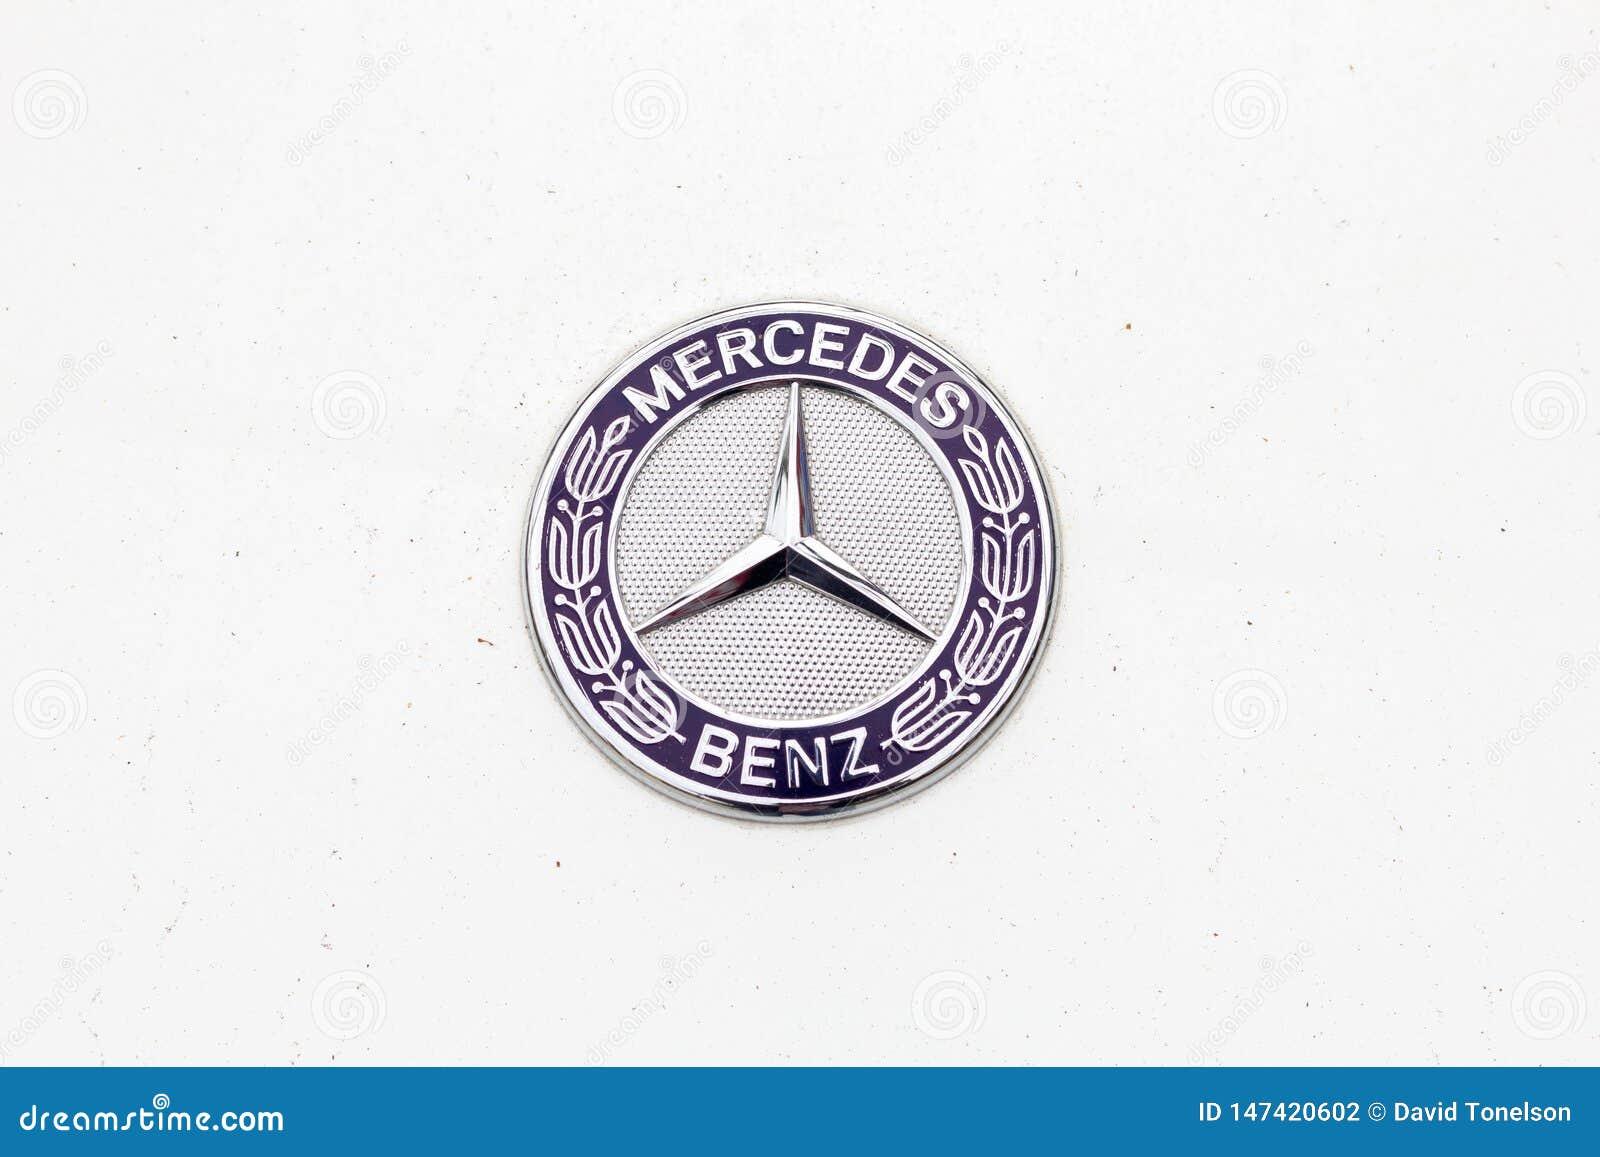 Motor den 25th f?r det chengdu f?r benz 14th 16th 2011 logoen mercedes porslinet show f?r v?g s september till v?stra